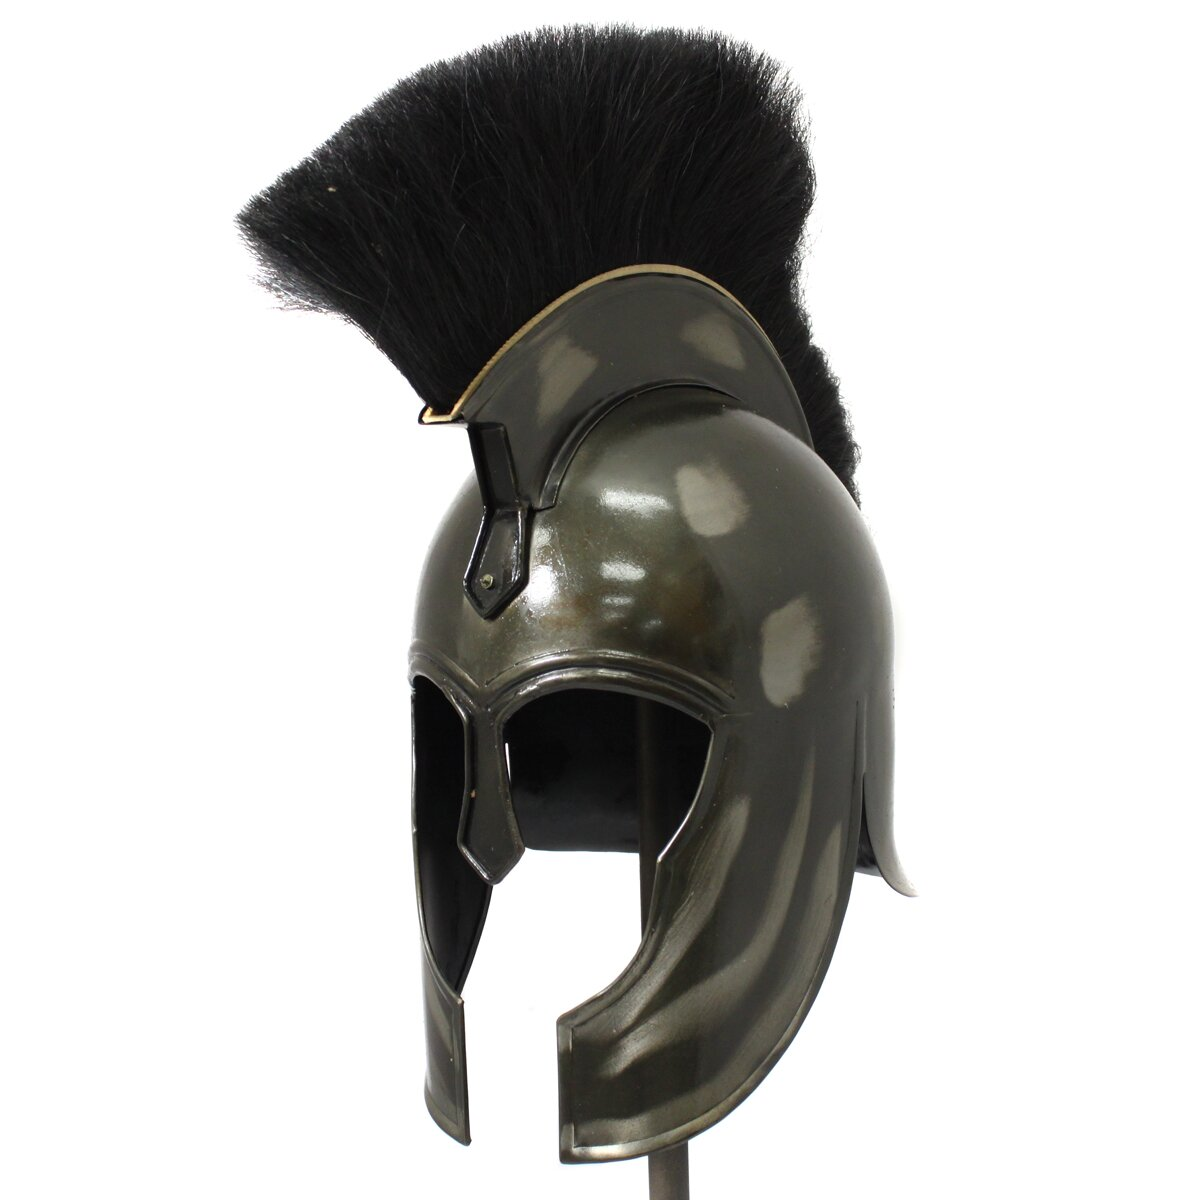 Antique Replica Trojan War Armor Helmet Sculpture Wayfair